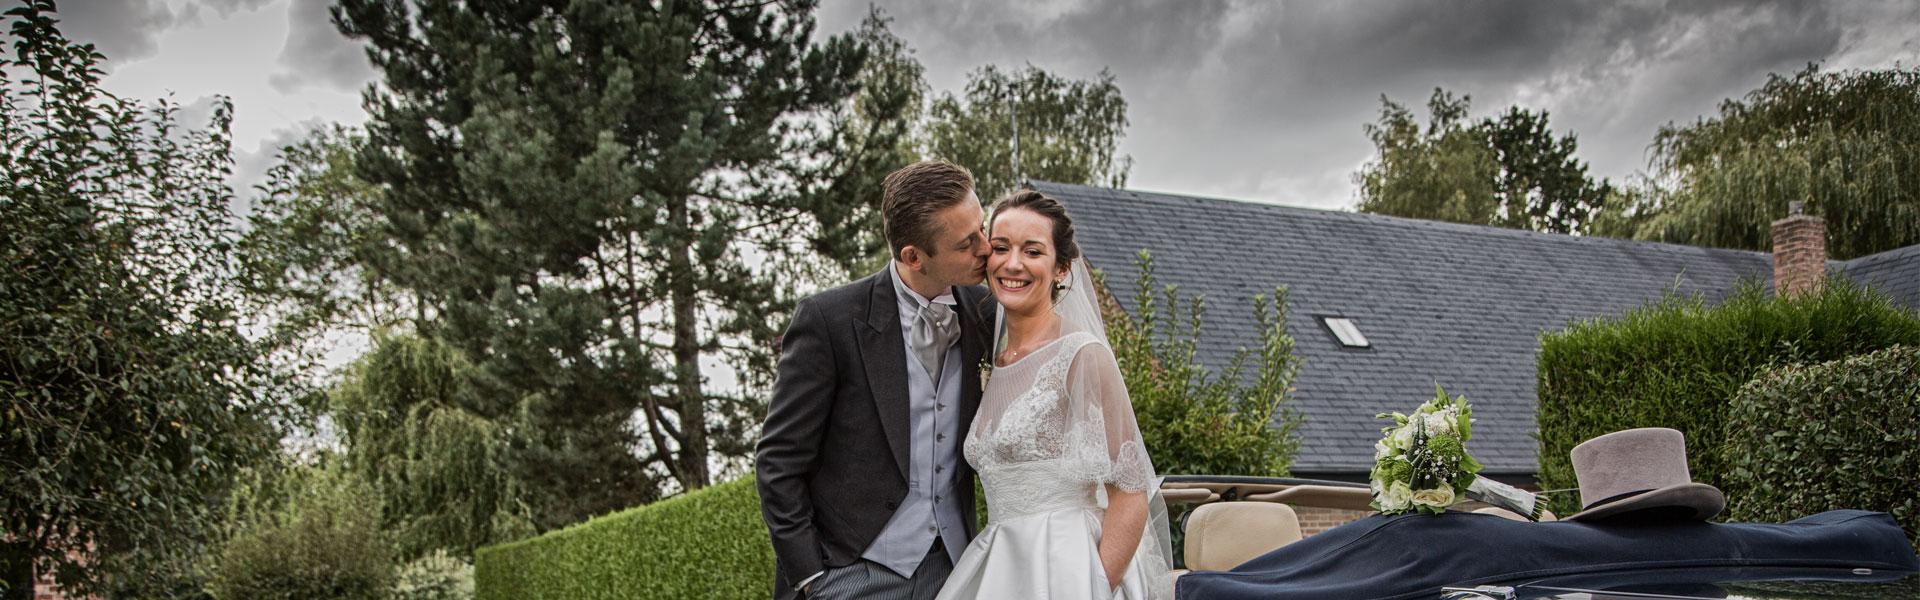 Clothilde Thibault by wedding video photo